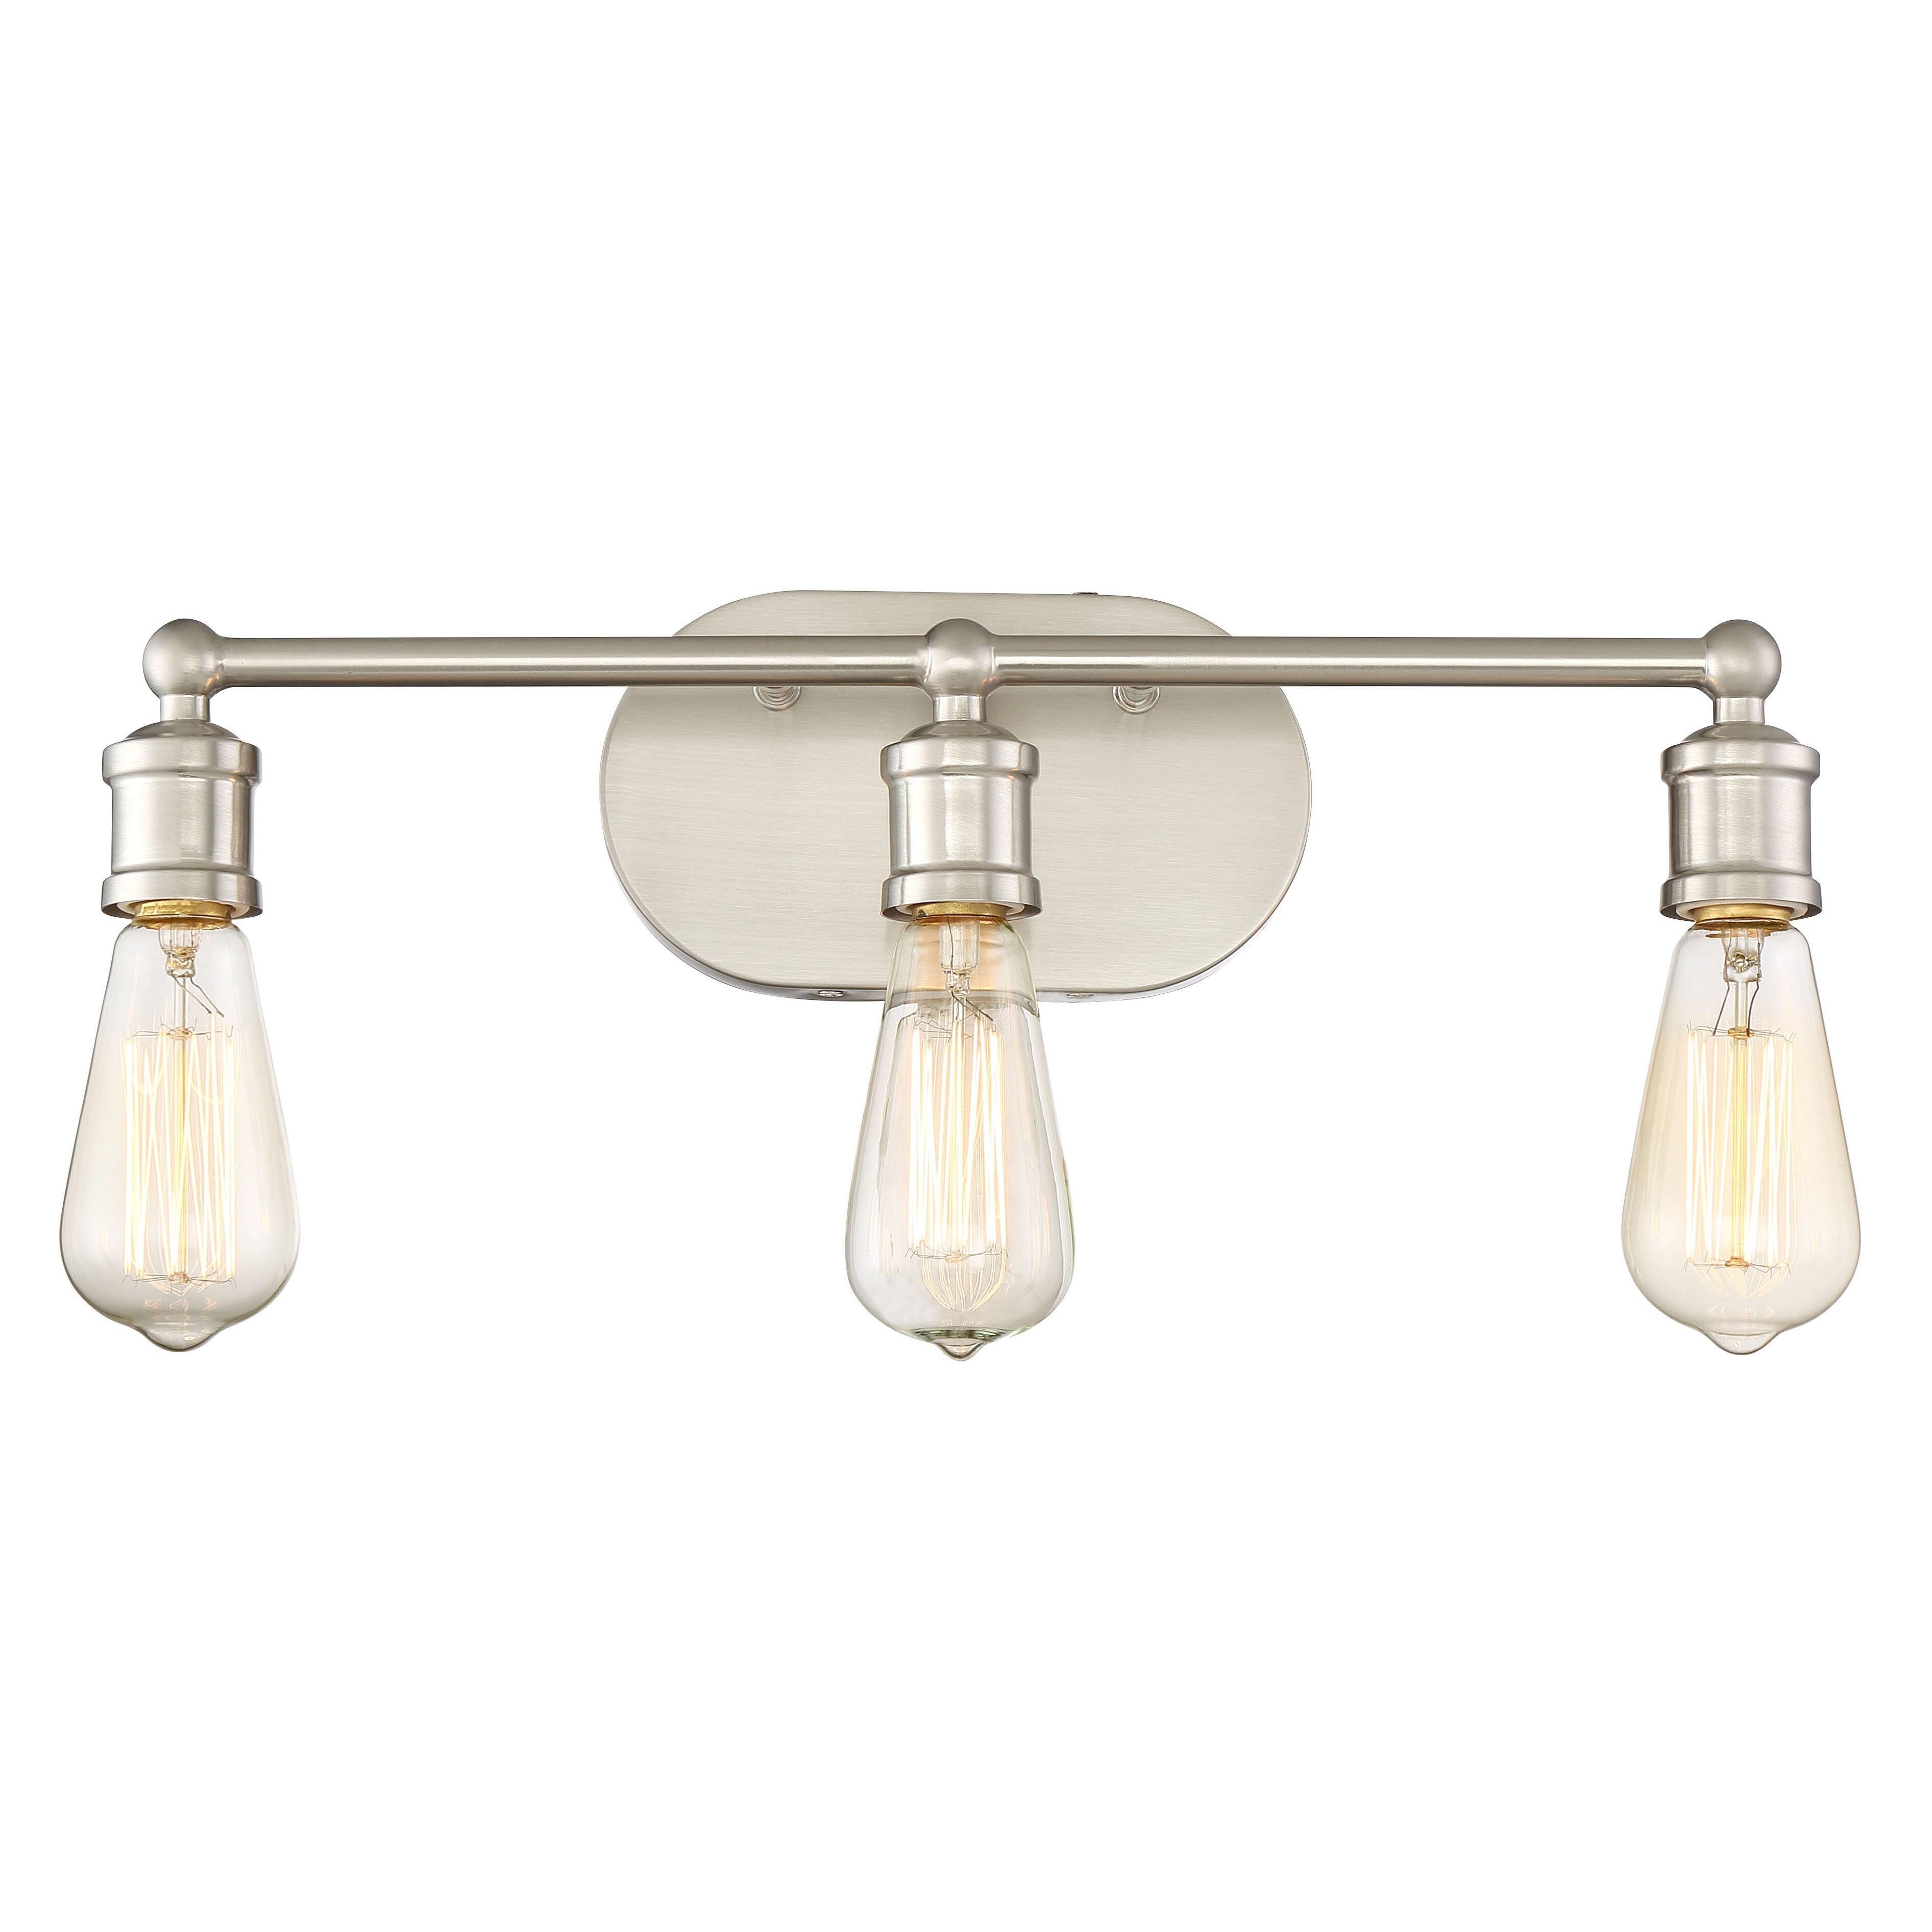 Bedroom Vanity Sets With Lights Laurel Foundry Modern Farmhouse Agave 3 Light Vanity Light